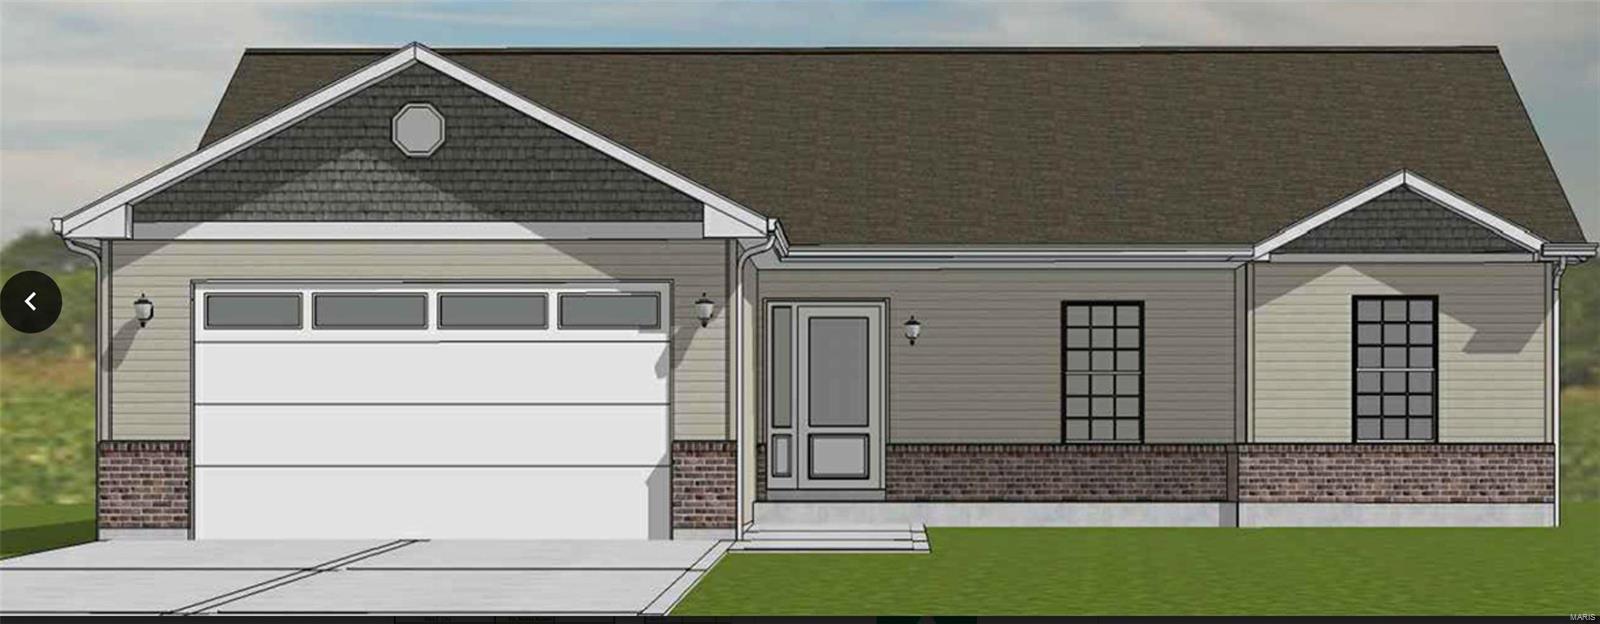 129 Garrettford Property Photo - Bethalto, IL real estate listing